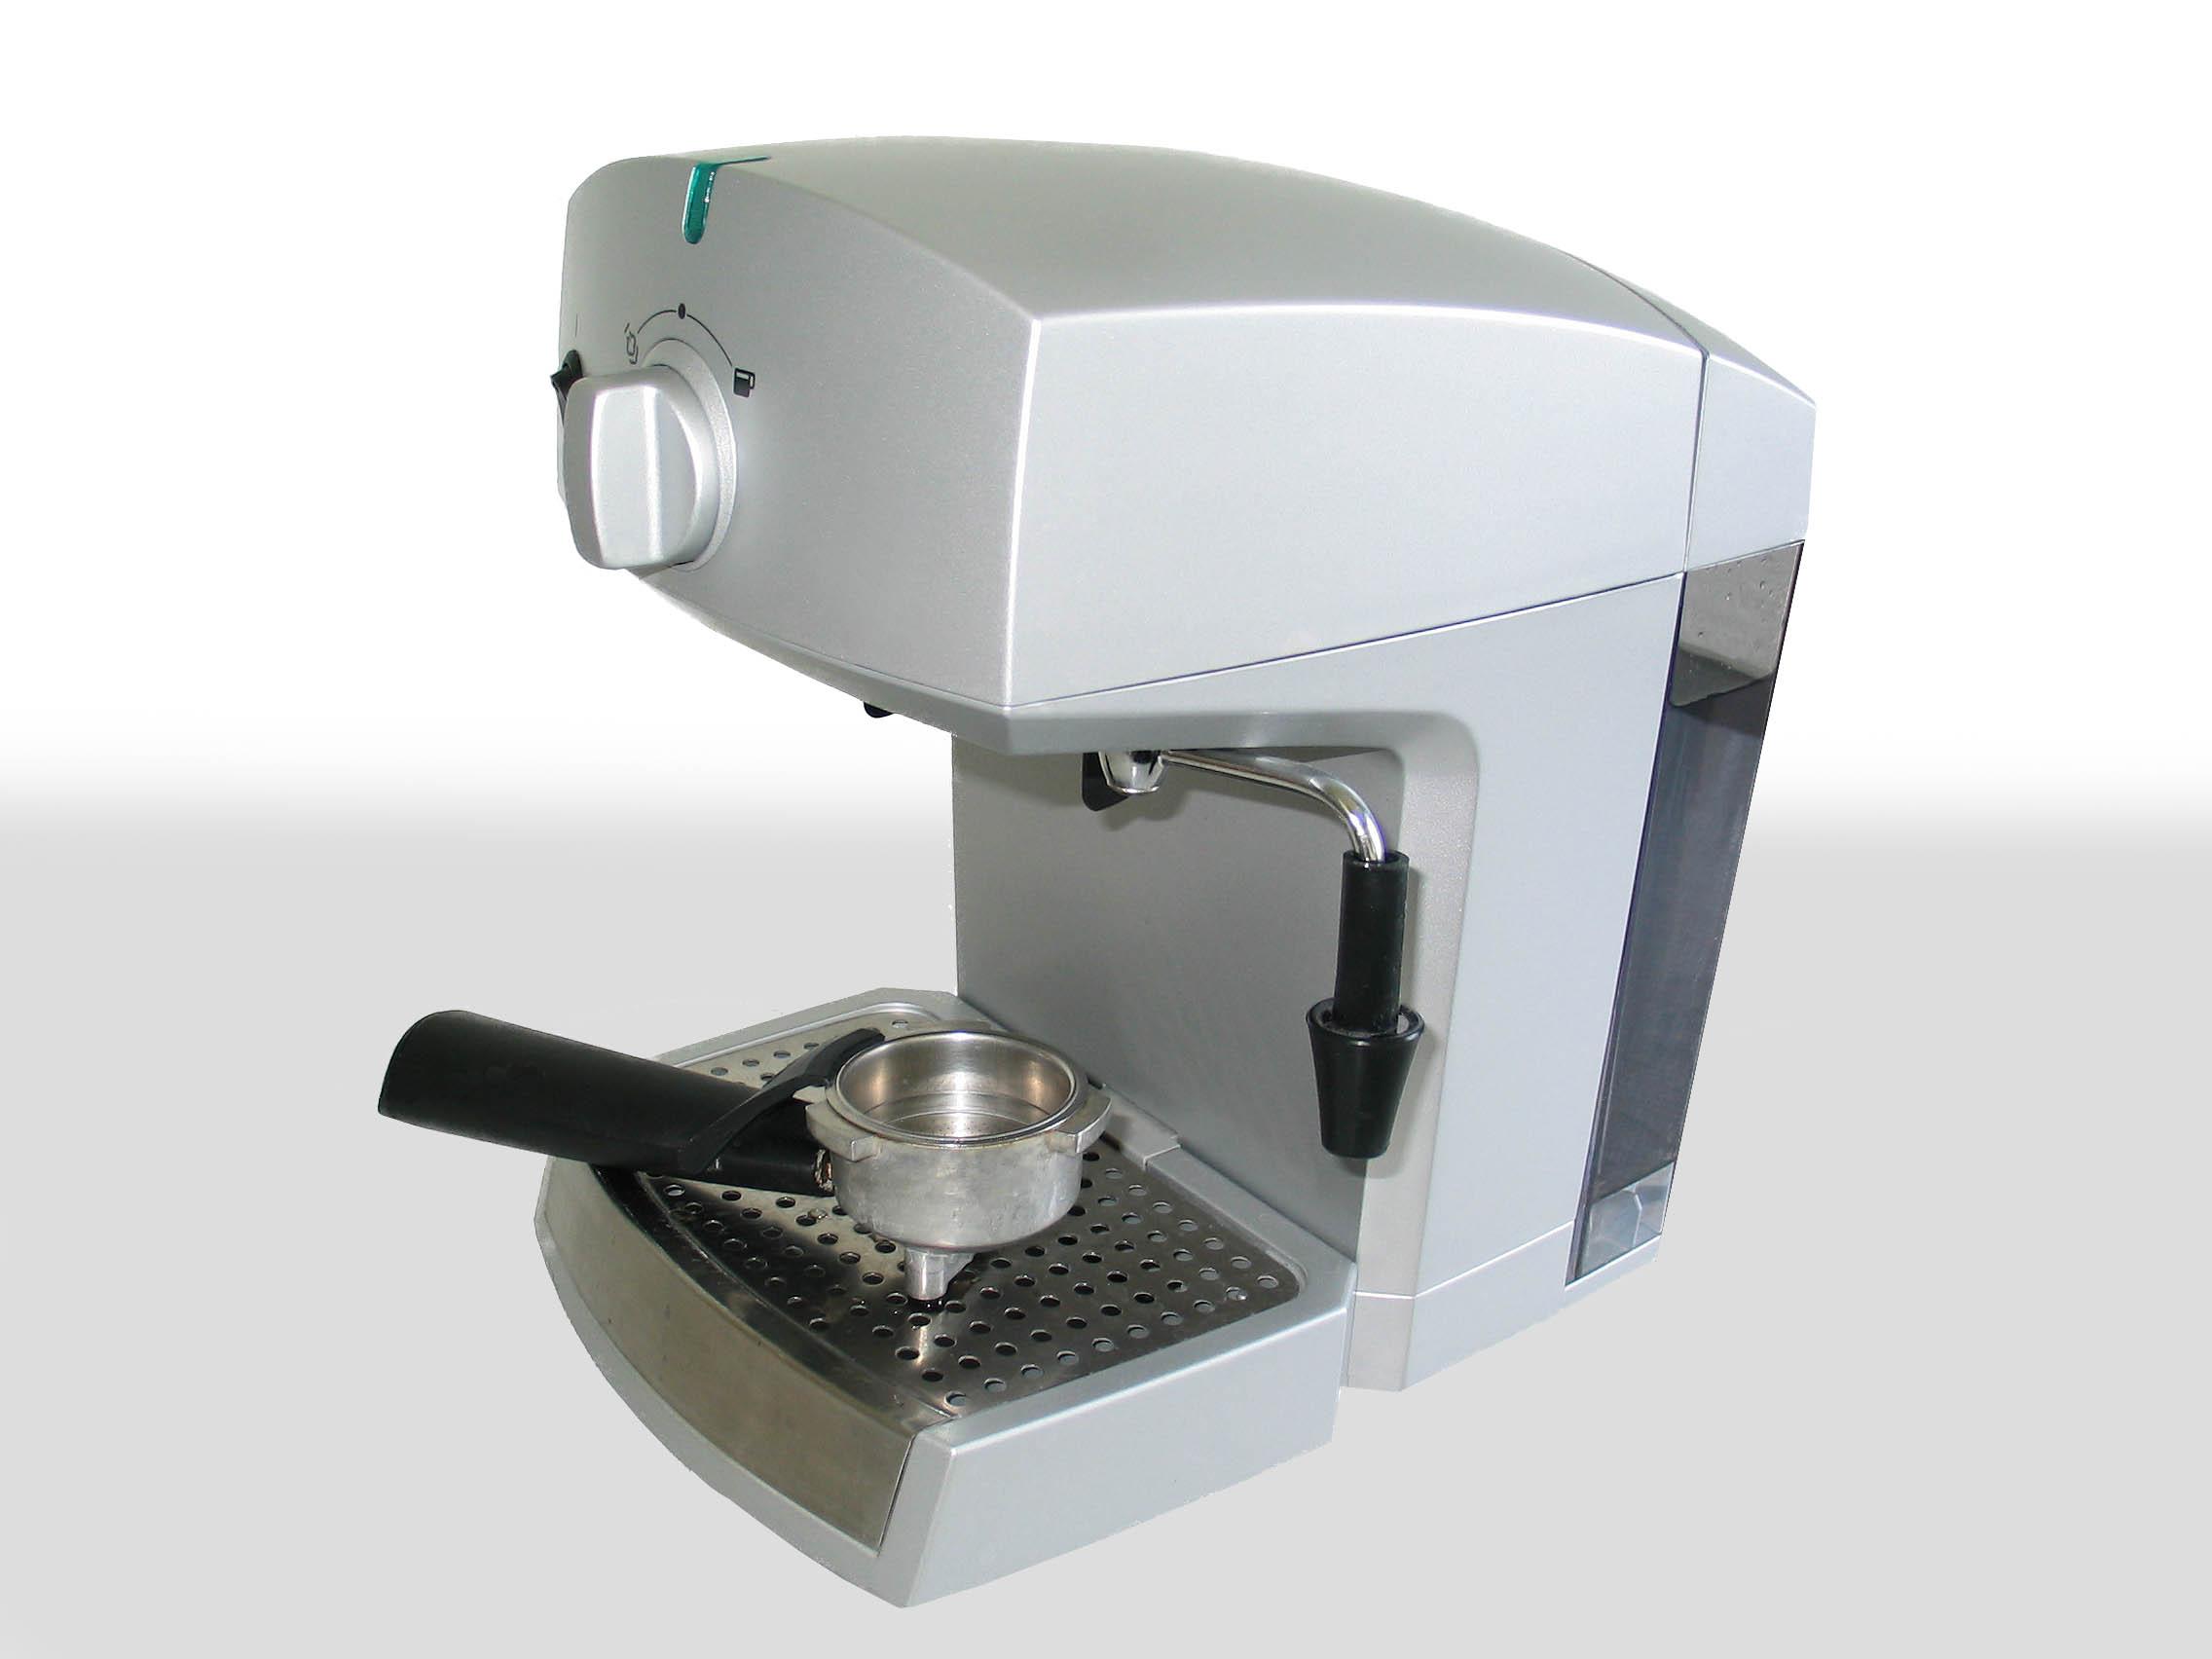 Automatic Coffee Machines Market in 360MarketUpdates.com